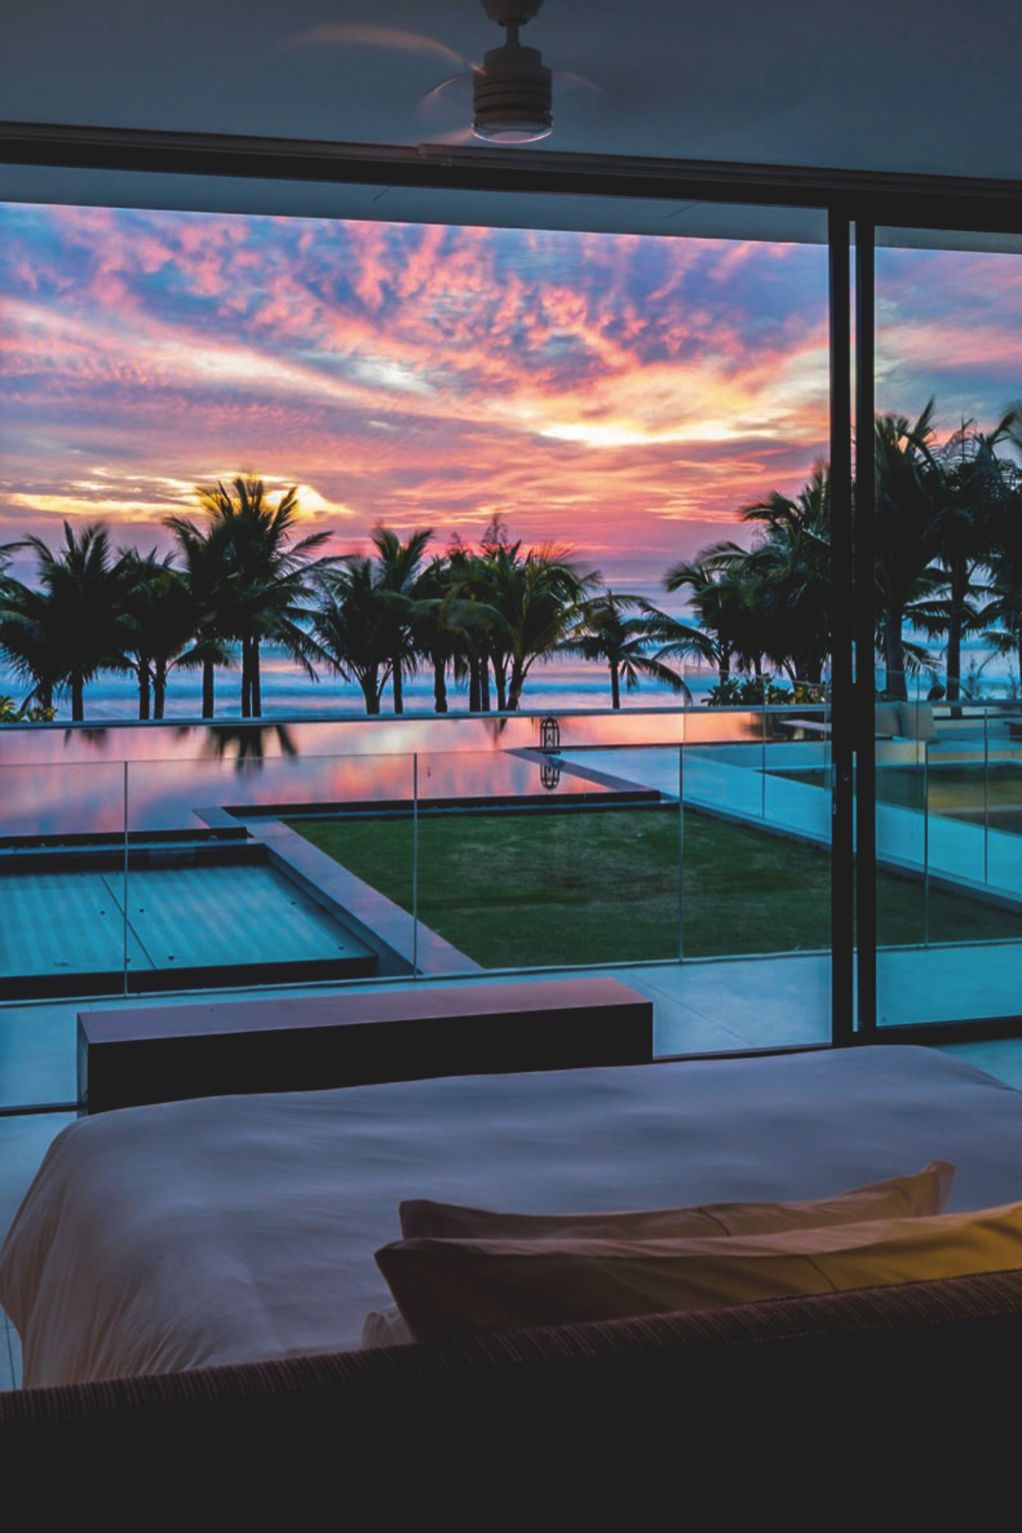 Blazepress The Most Popular Posts On The Internet House Styles Top Interior Design Firms Best Interior Design